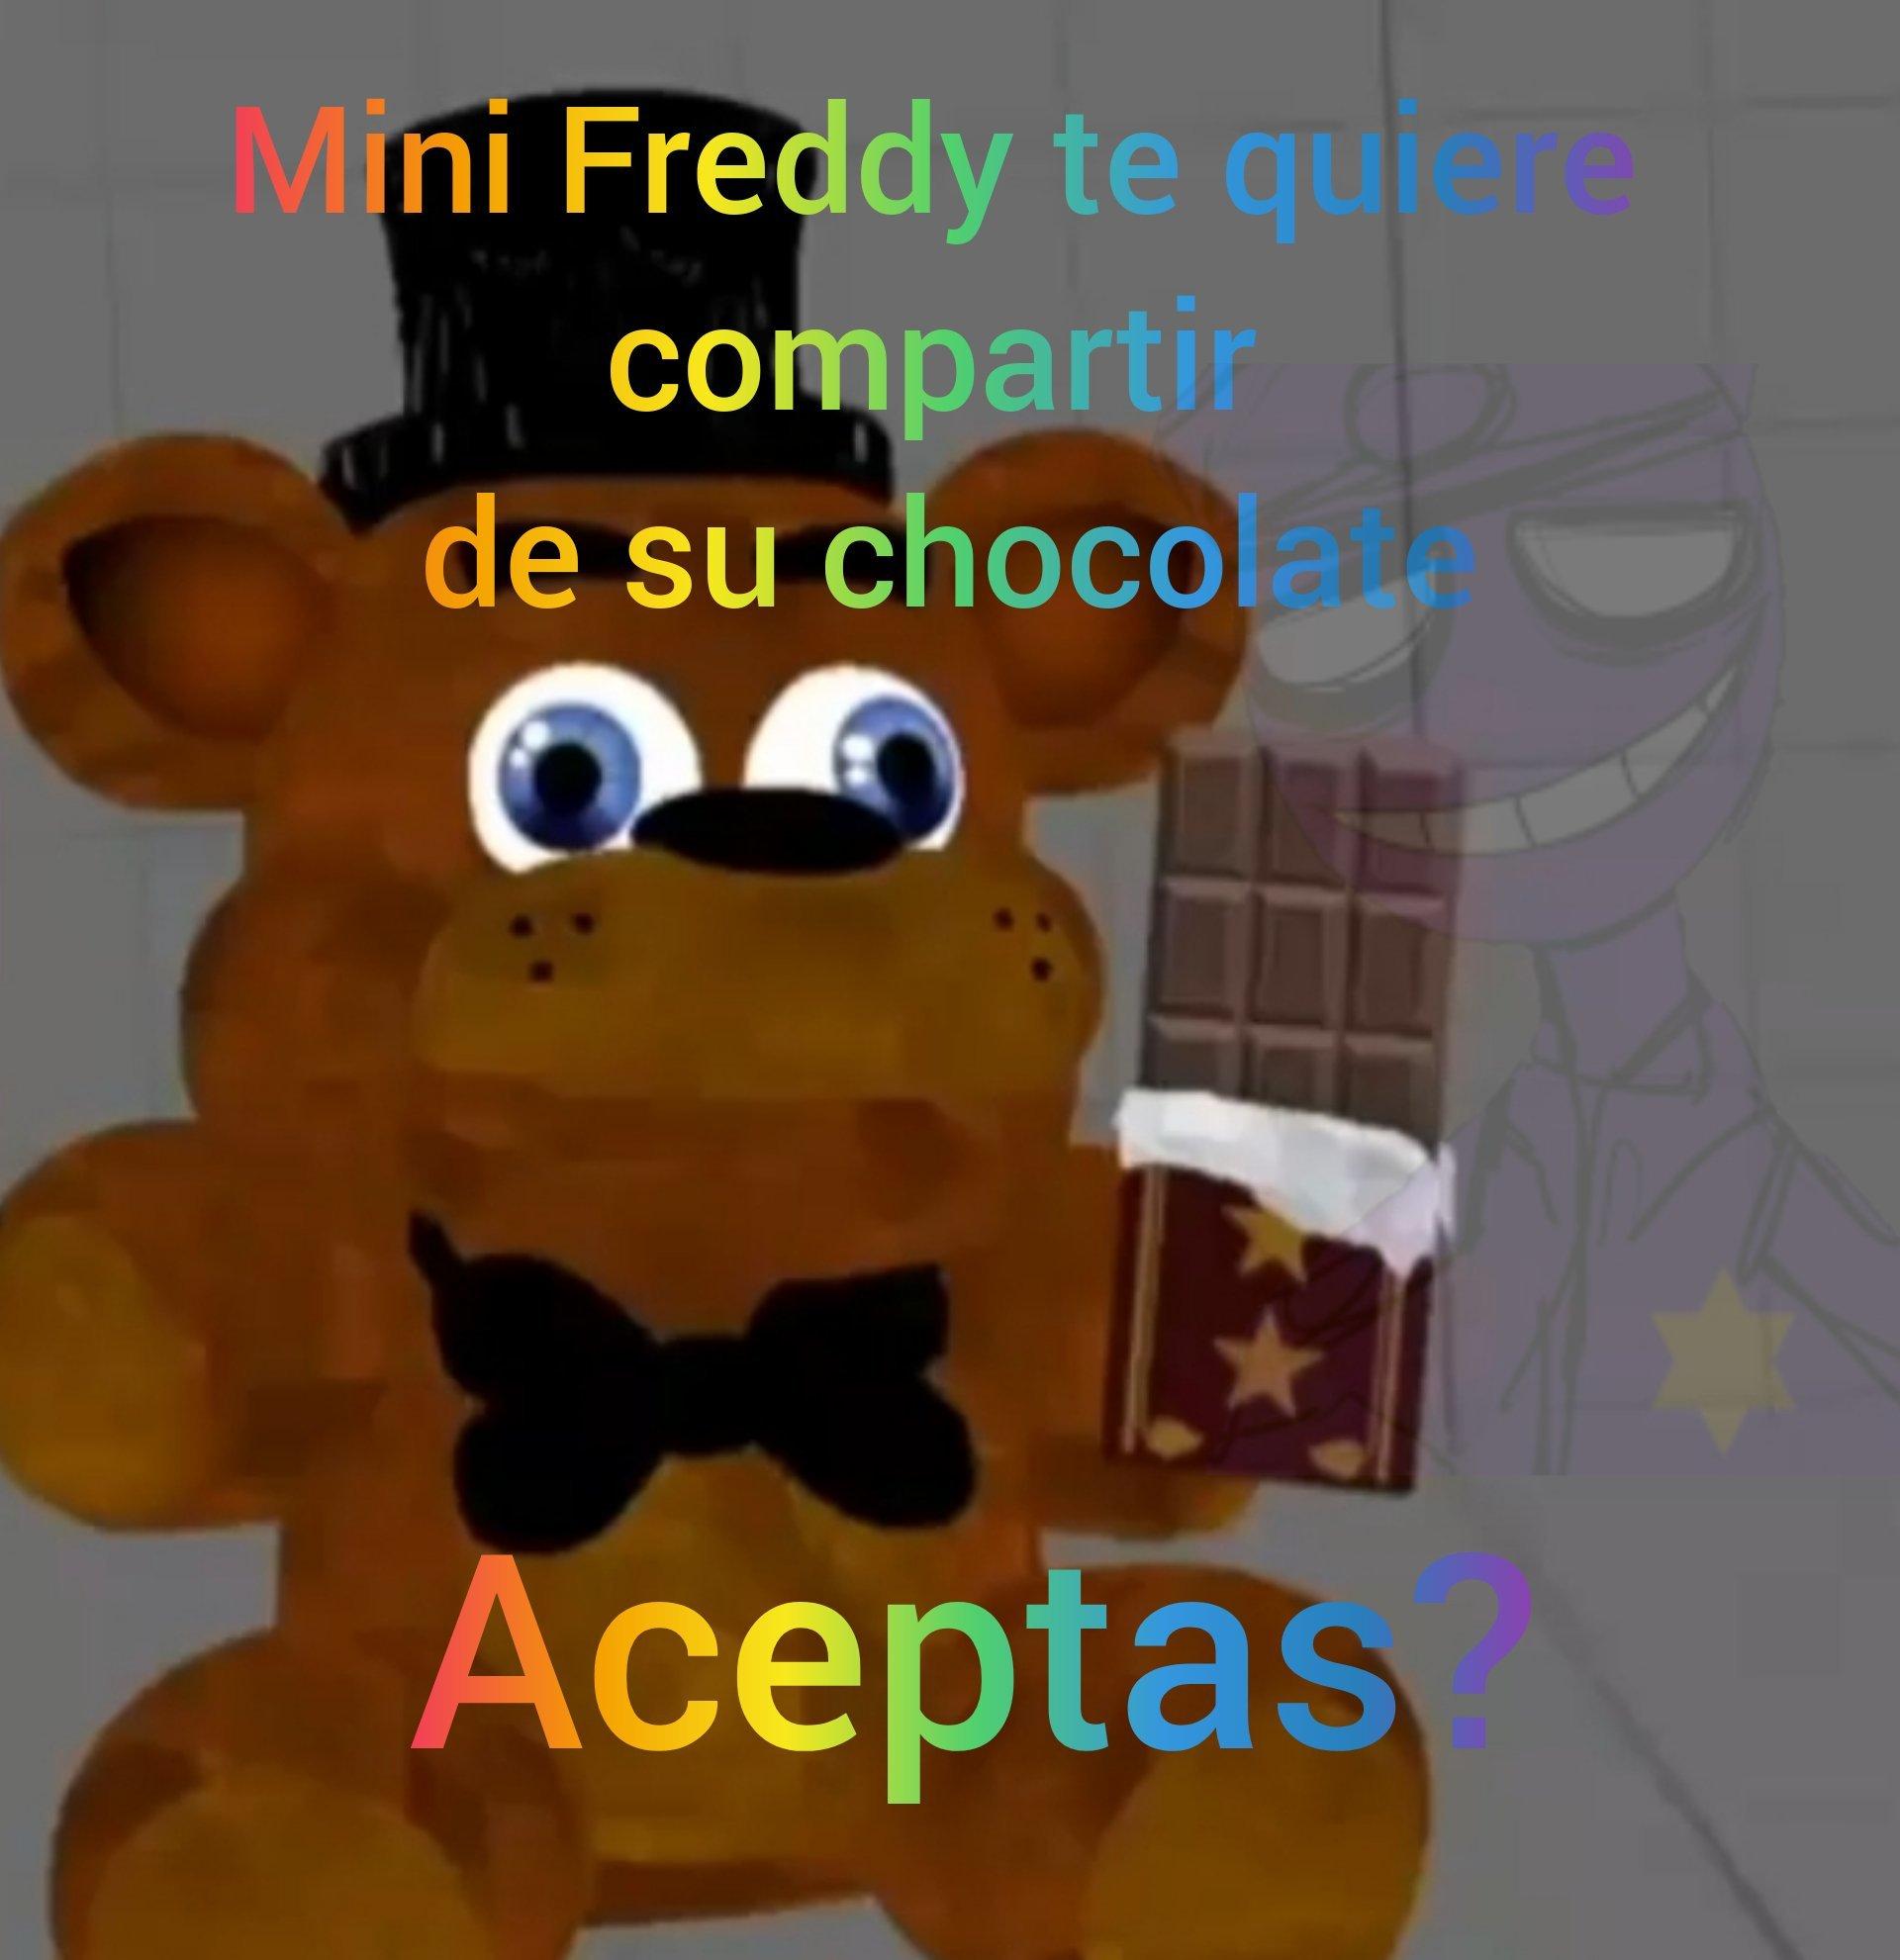 si no aceptas este meme;querido moderador,mini Freddy no te va a dar chocolate :(